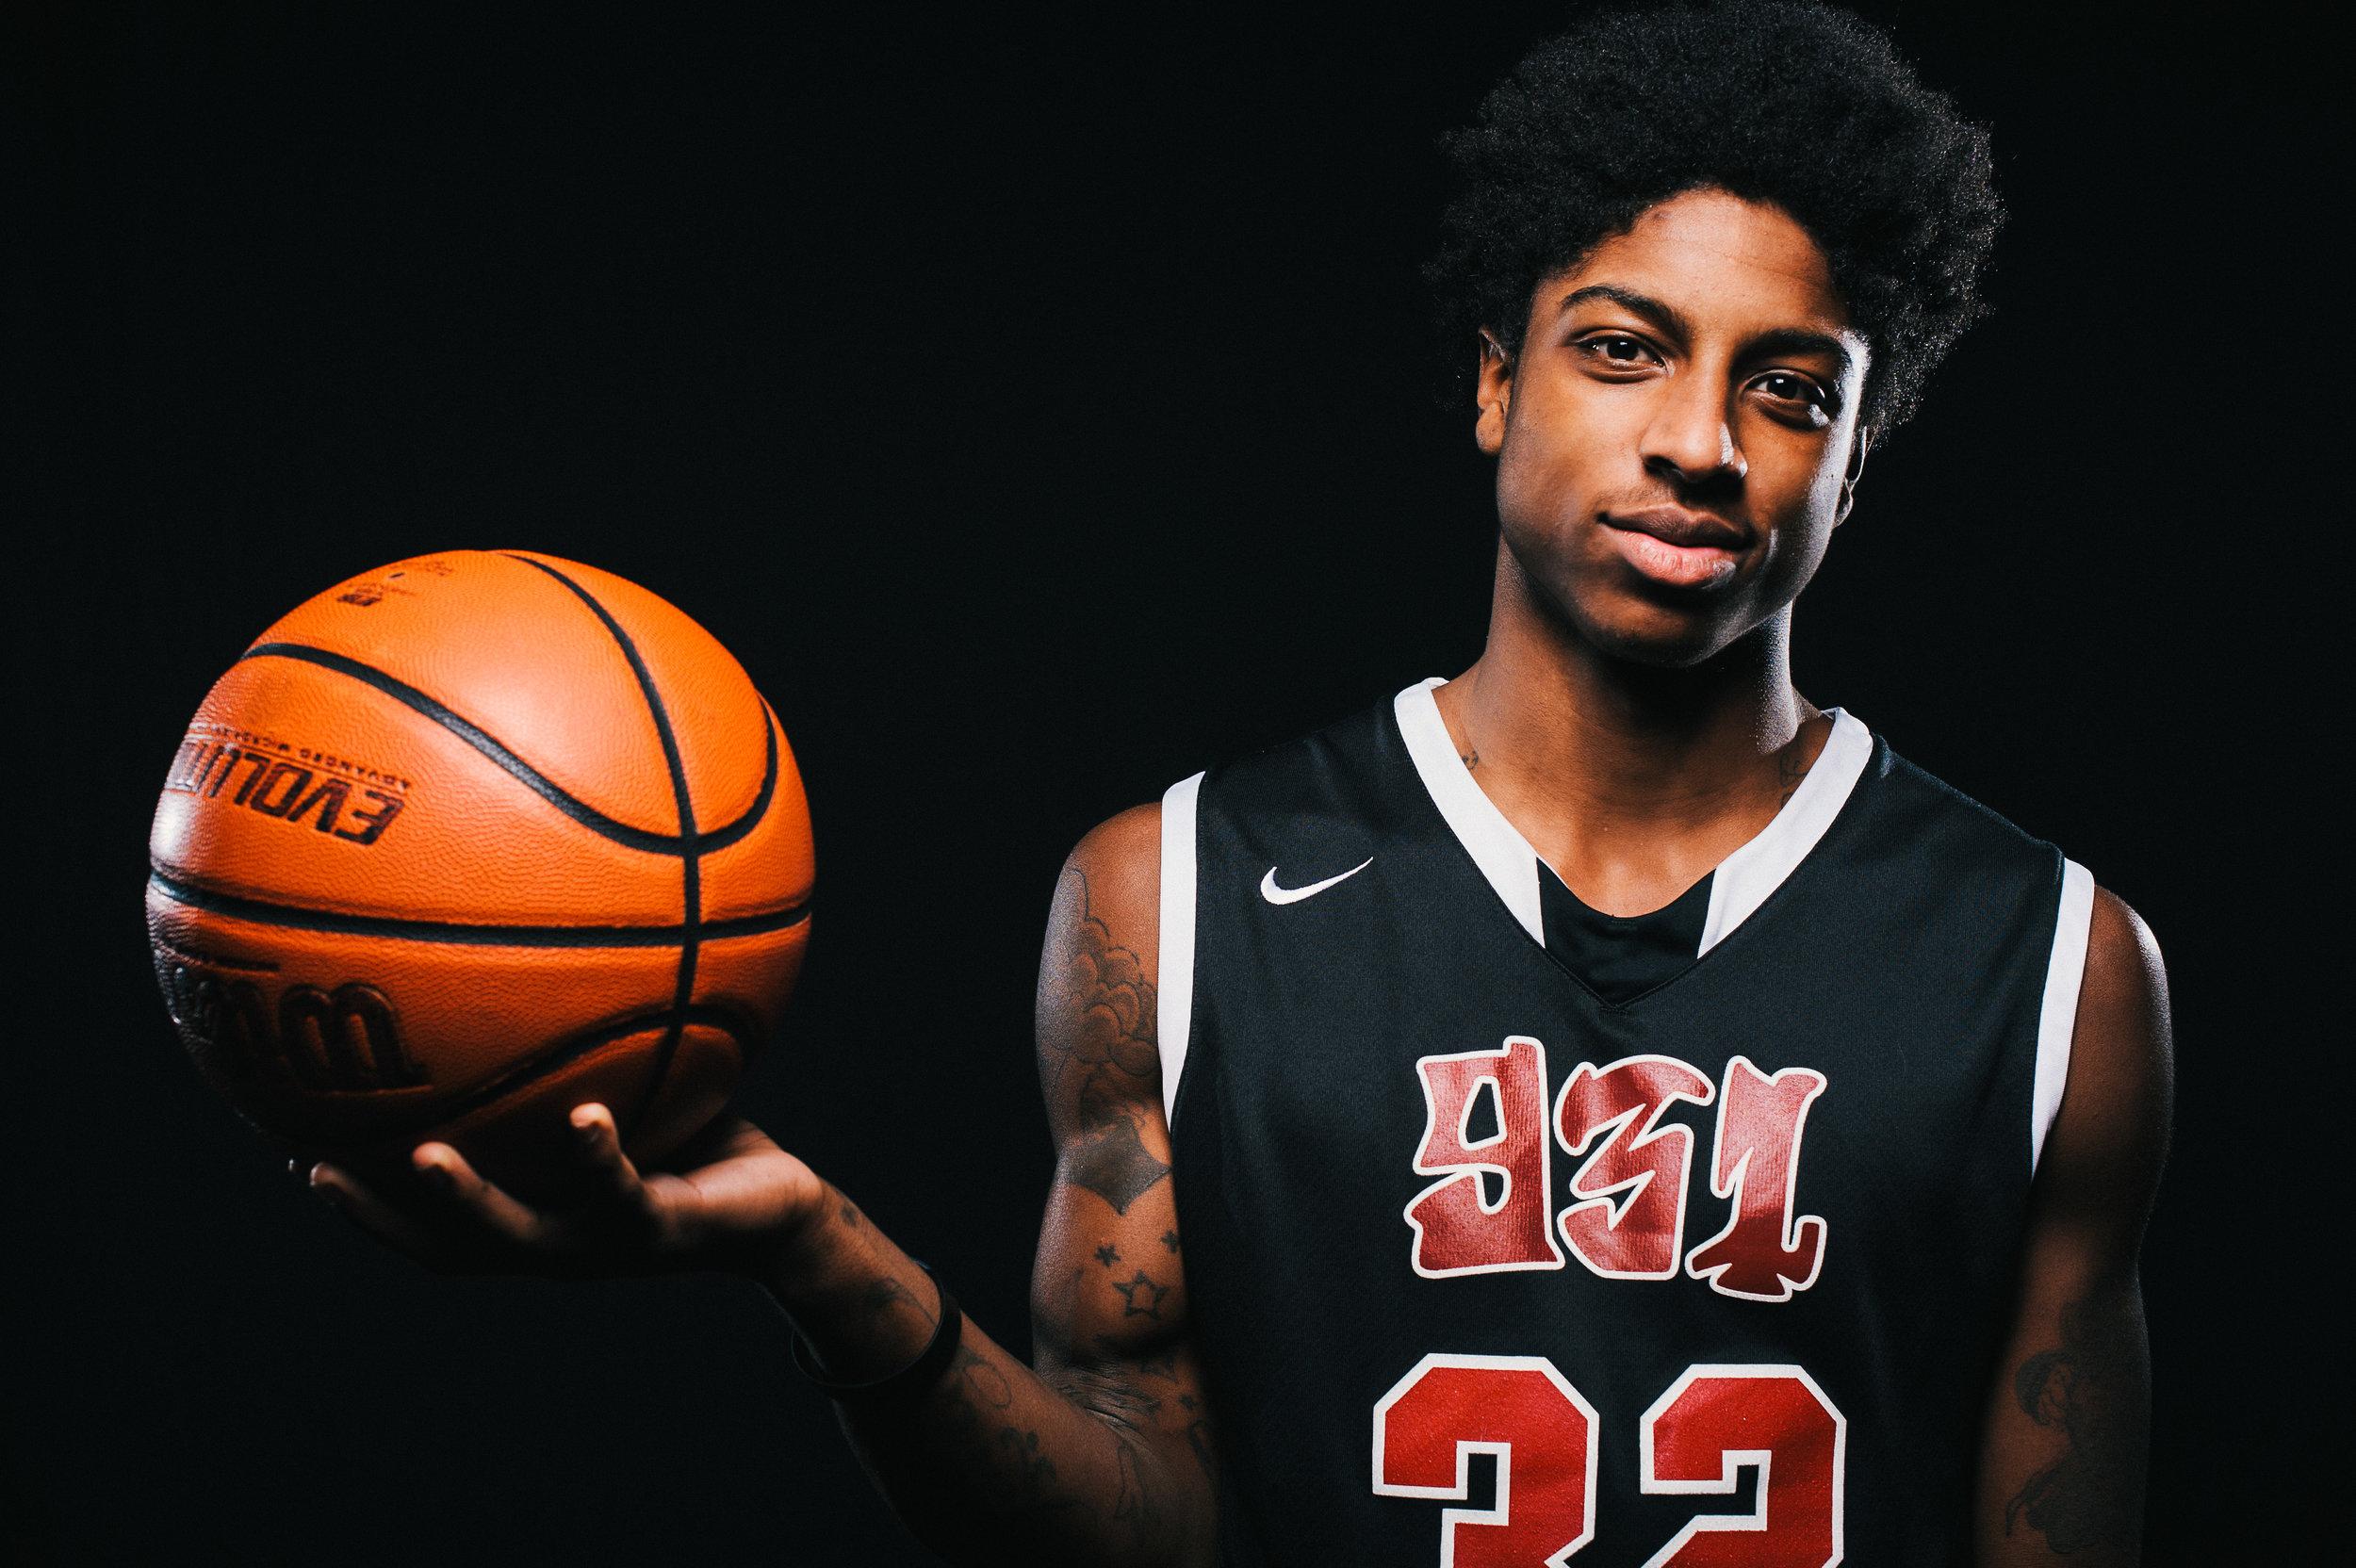 931-basketball-portraits-2014-205037.jpg